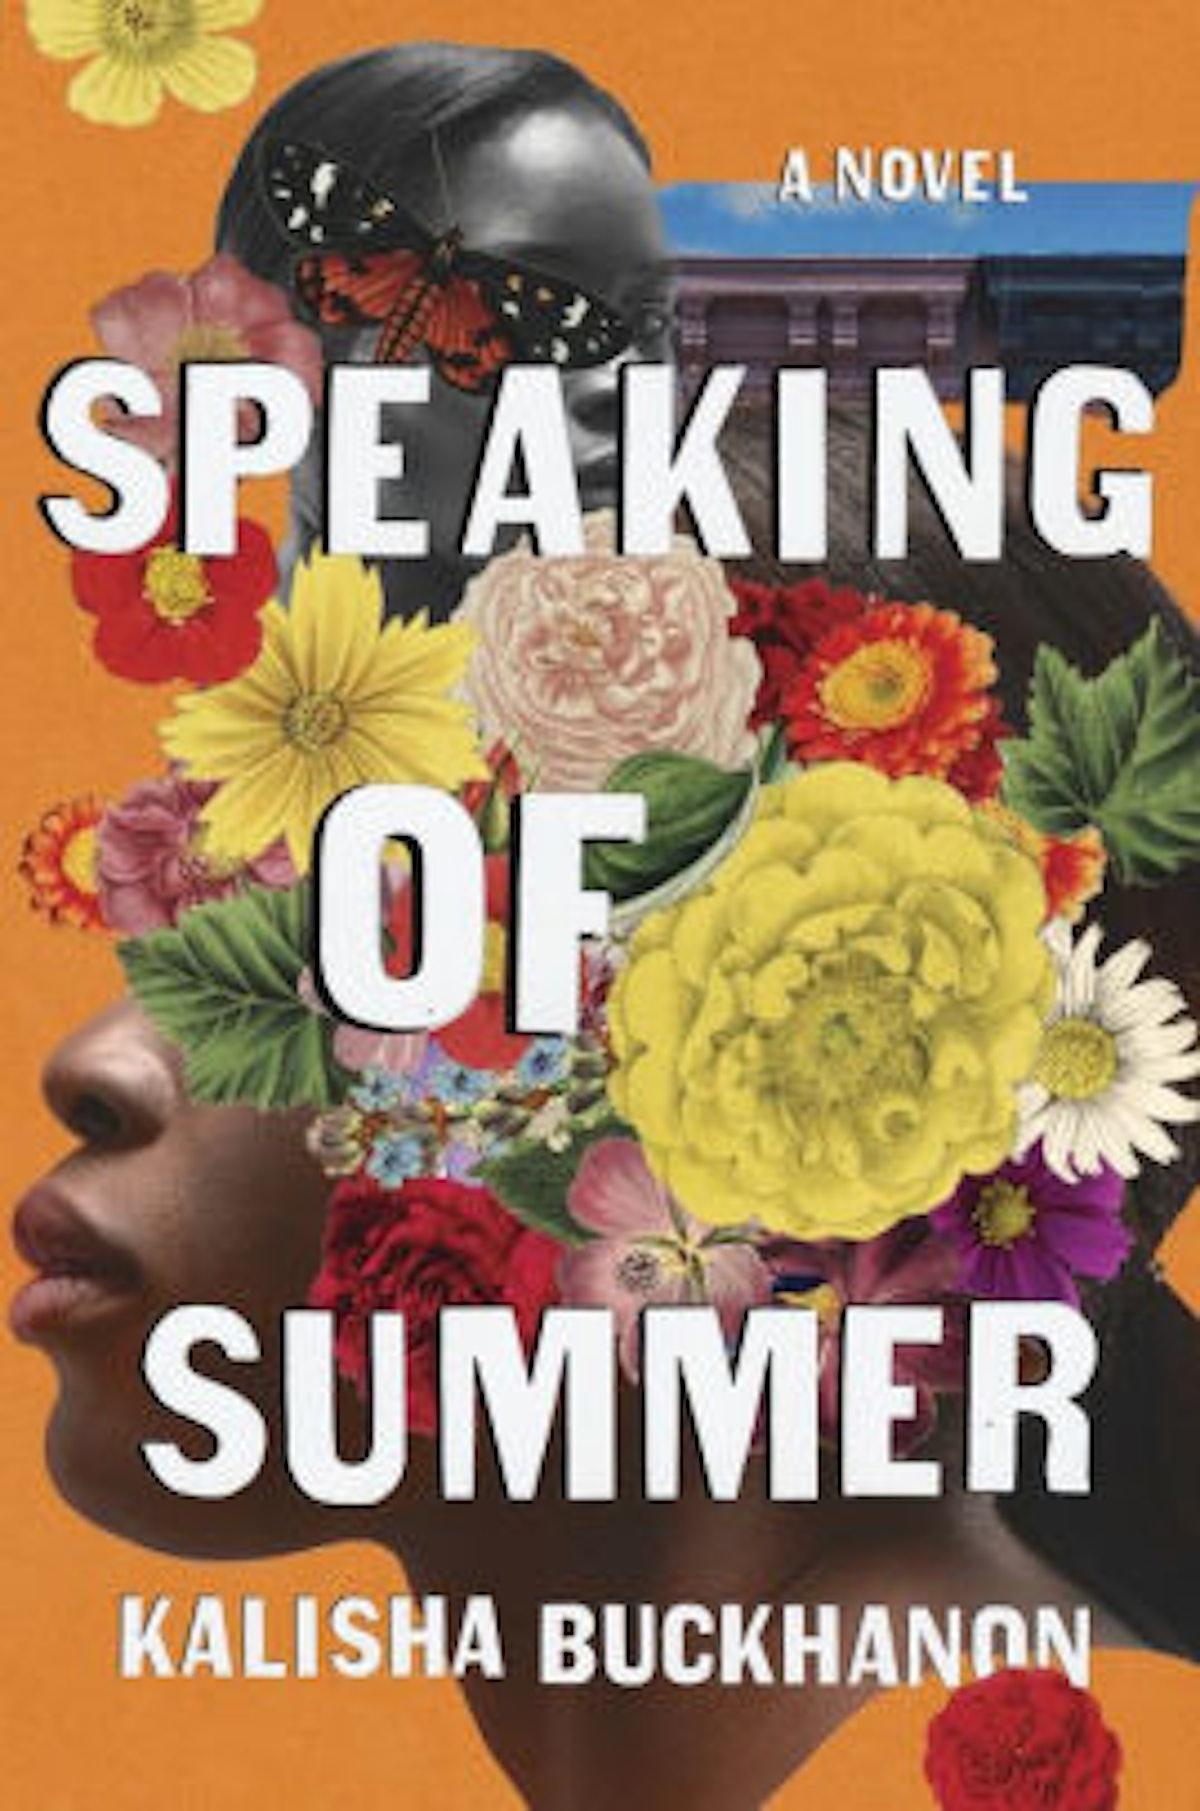 'Speaking of Summer' by Kalisha Buckhanon